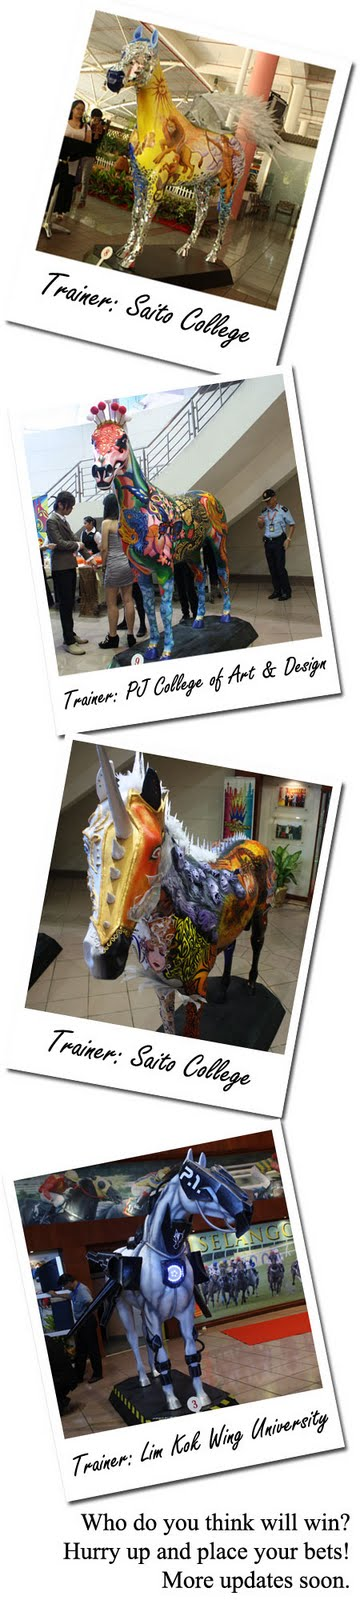 selangor turf club horse transformation 3